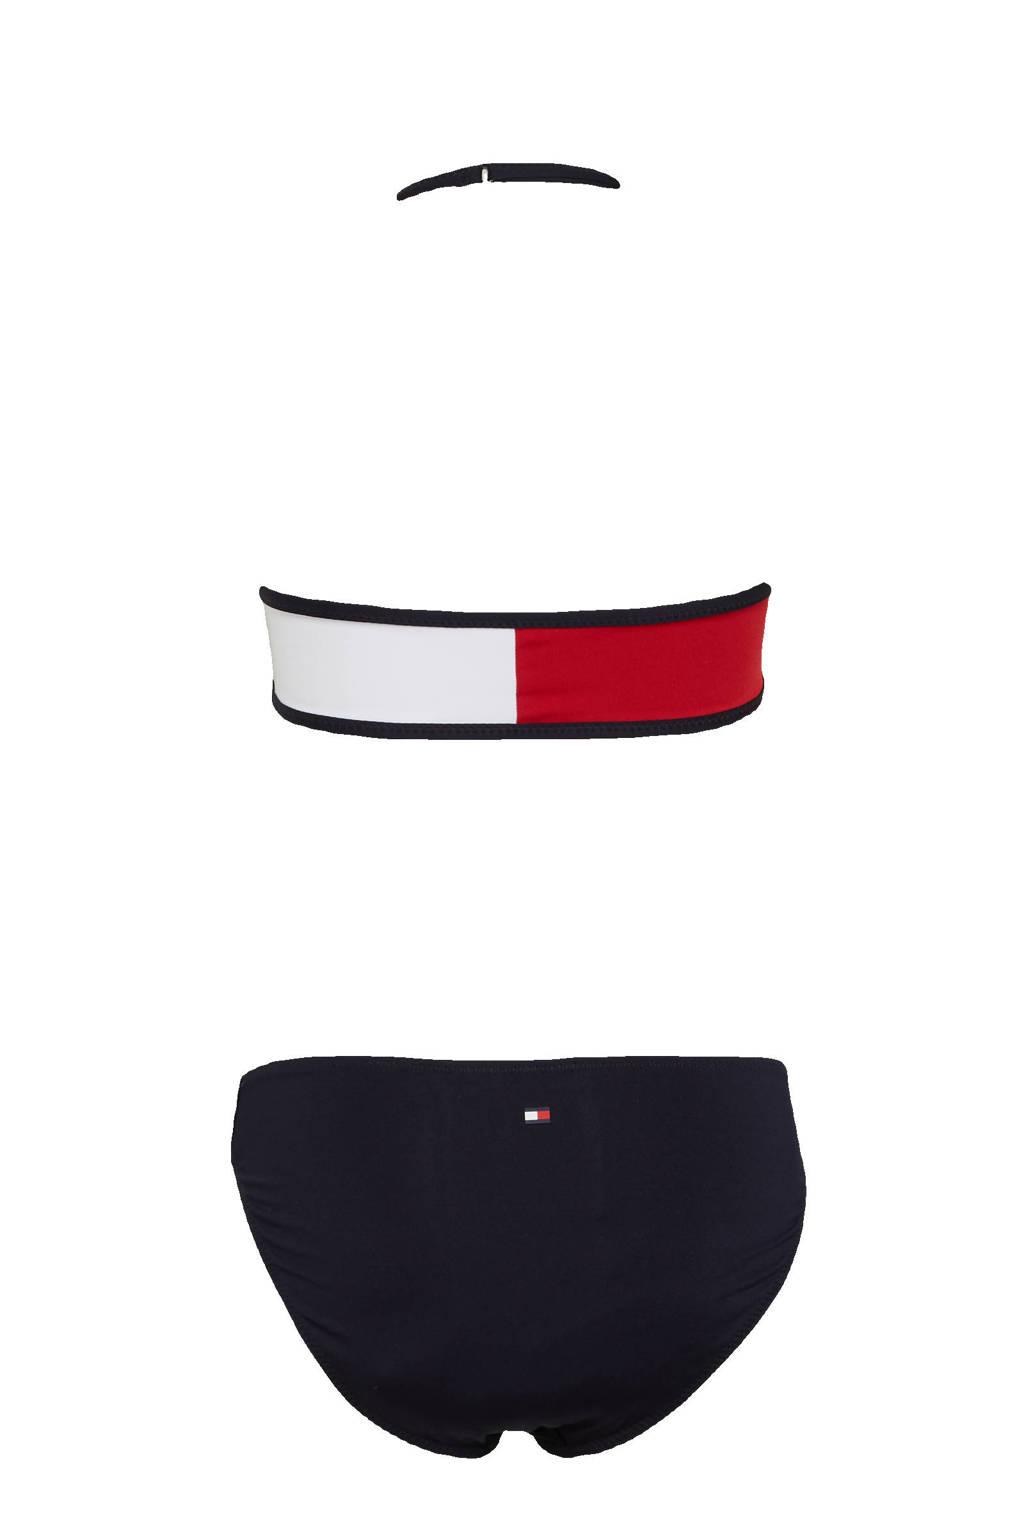 Tommy Hilfiger crop bikini donkerblauw/rood/wit, Donkerblauw/rood/wit